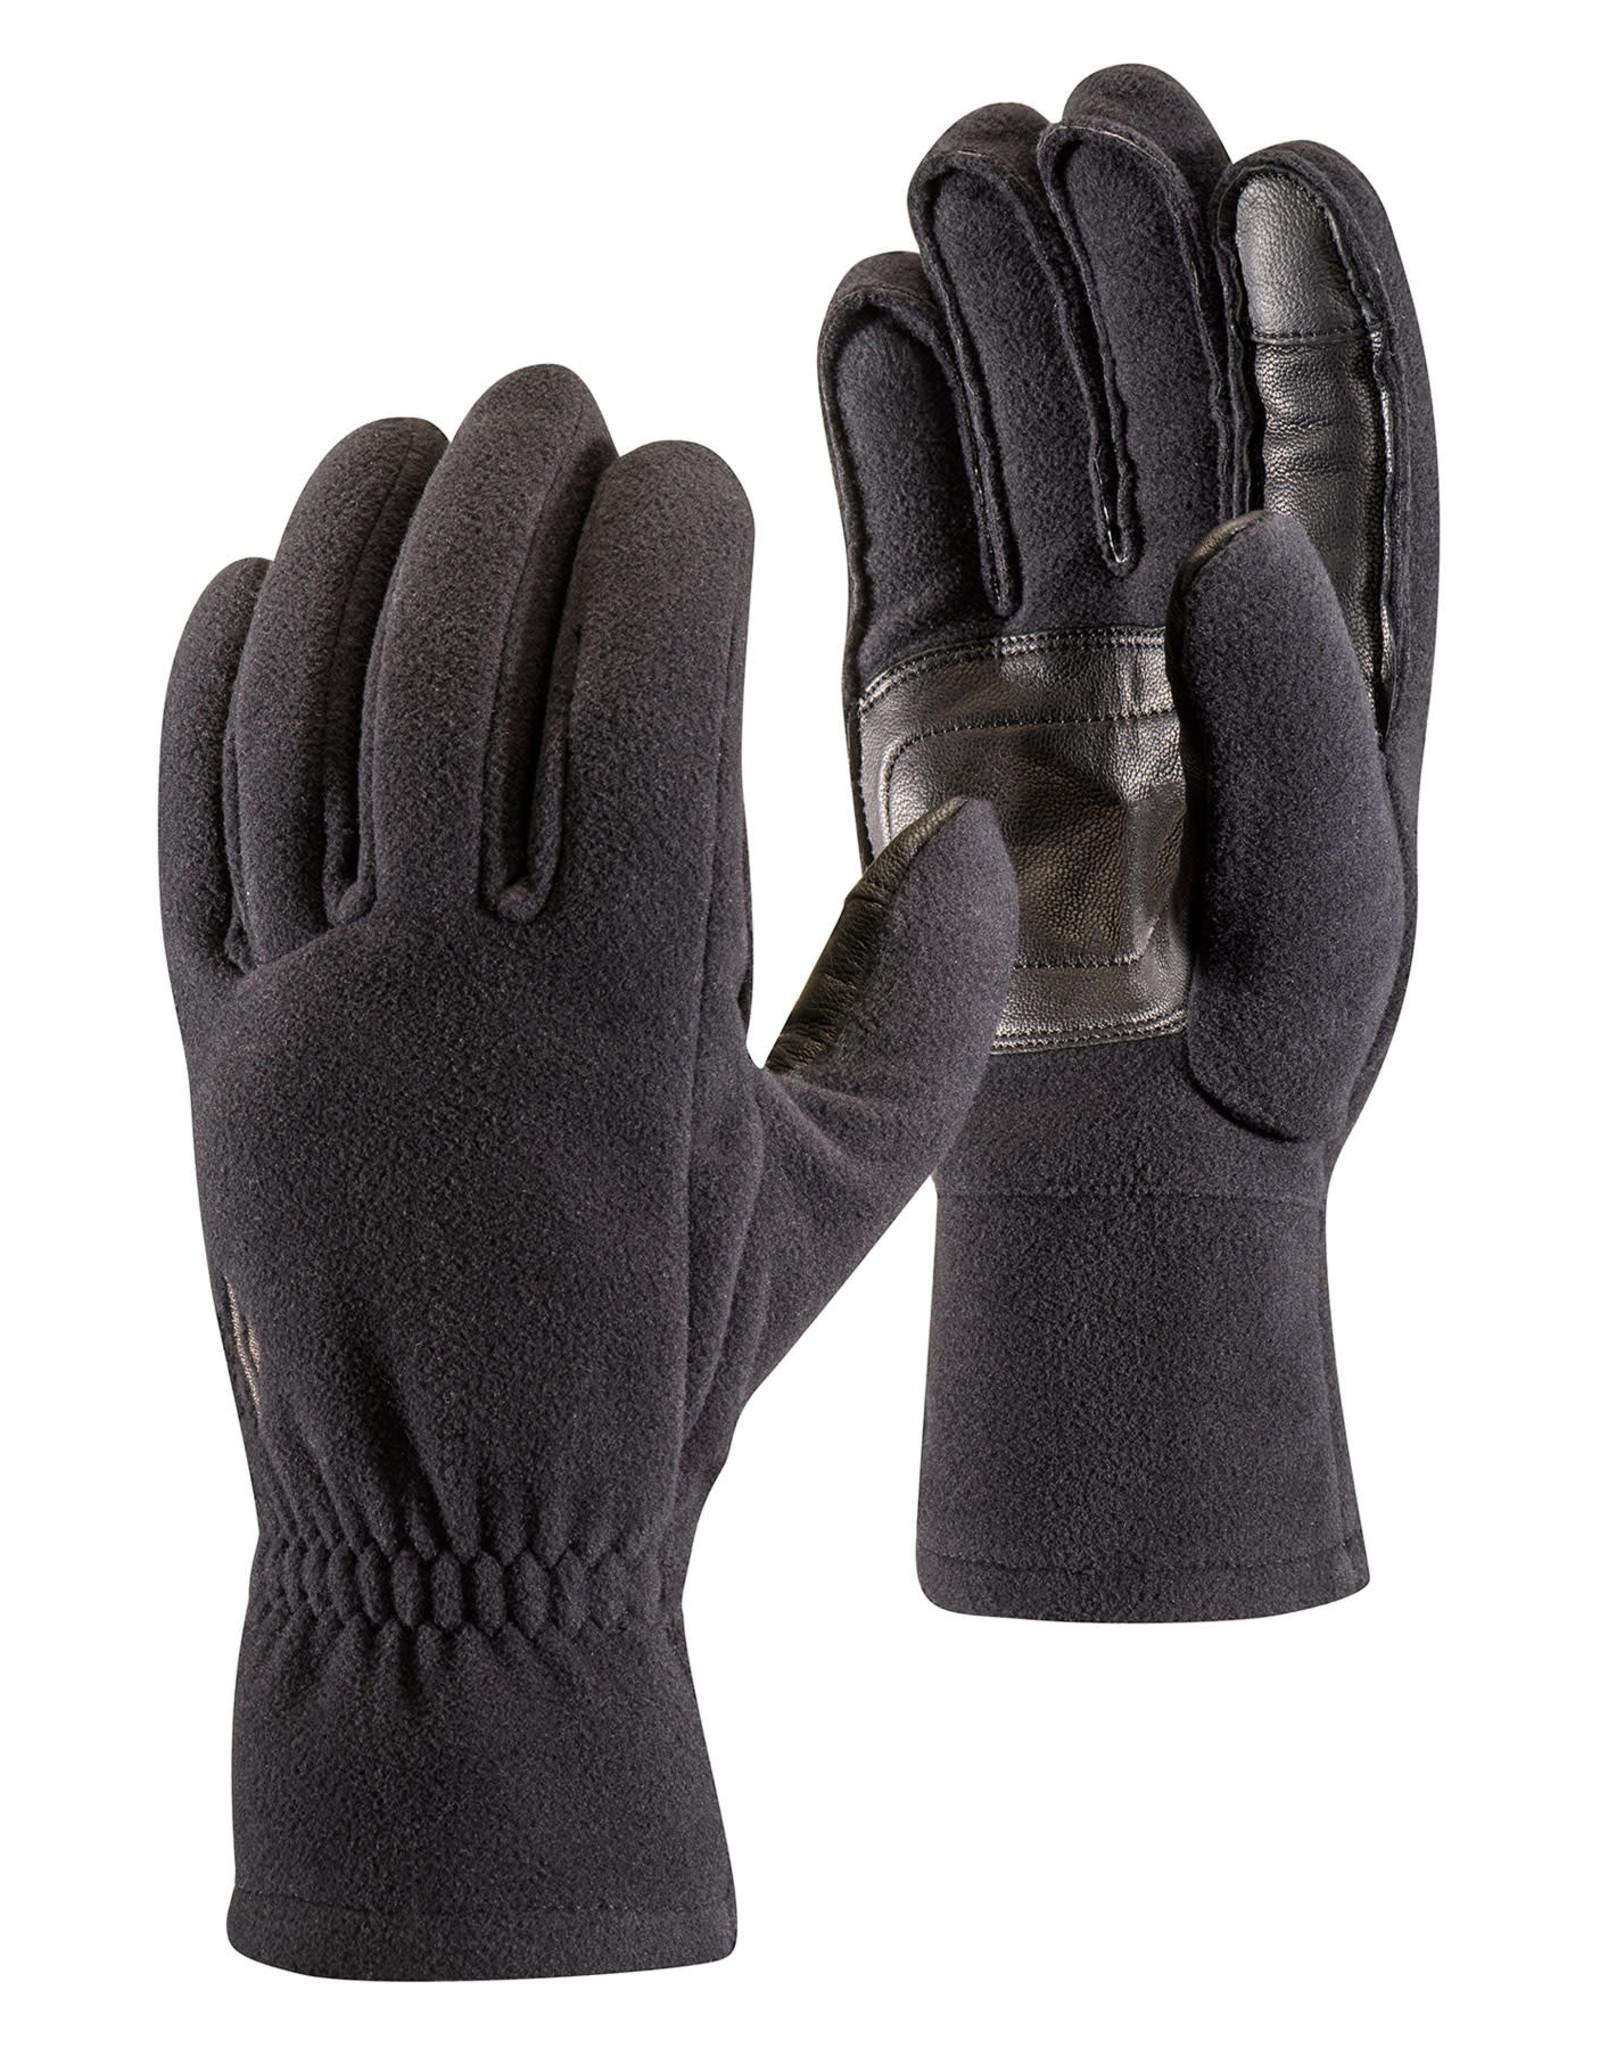 Black Diamond Midweight Windbloc Fleece Liner Glove